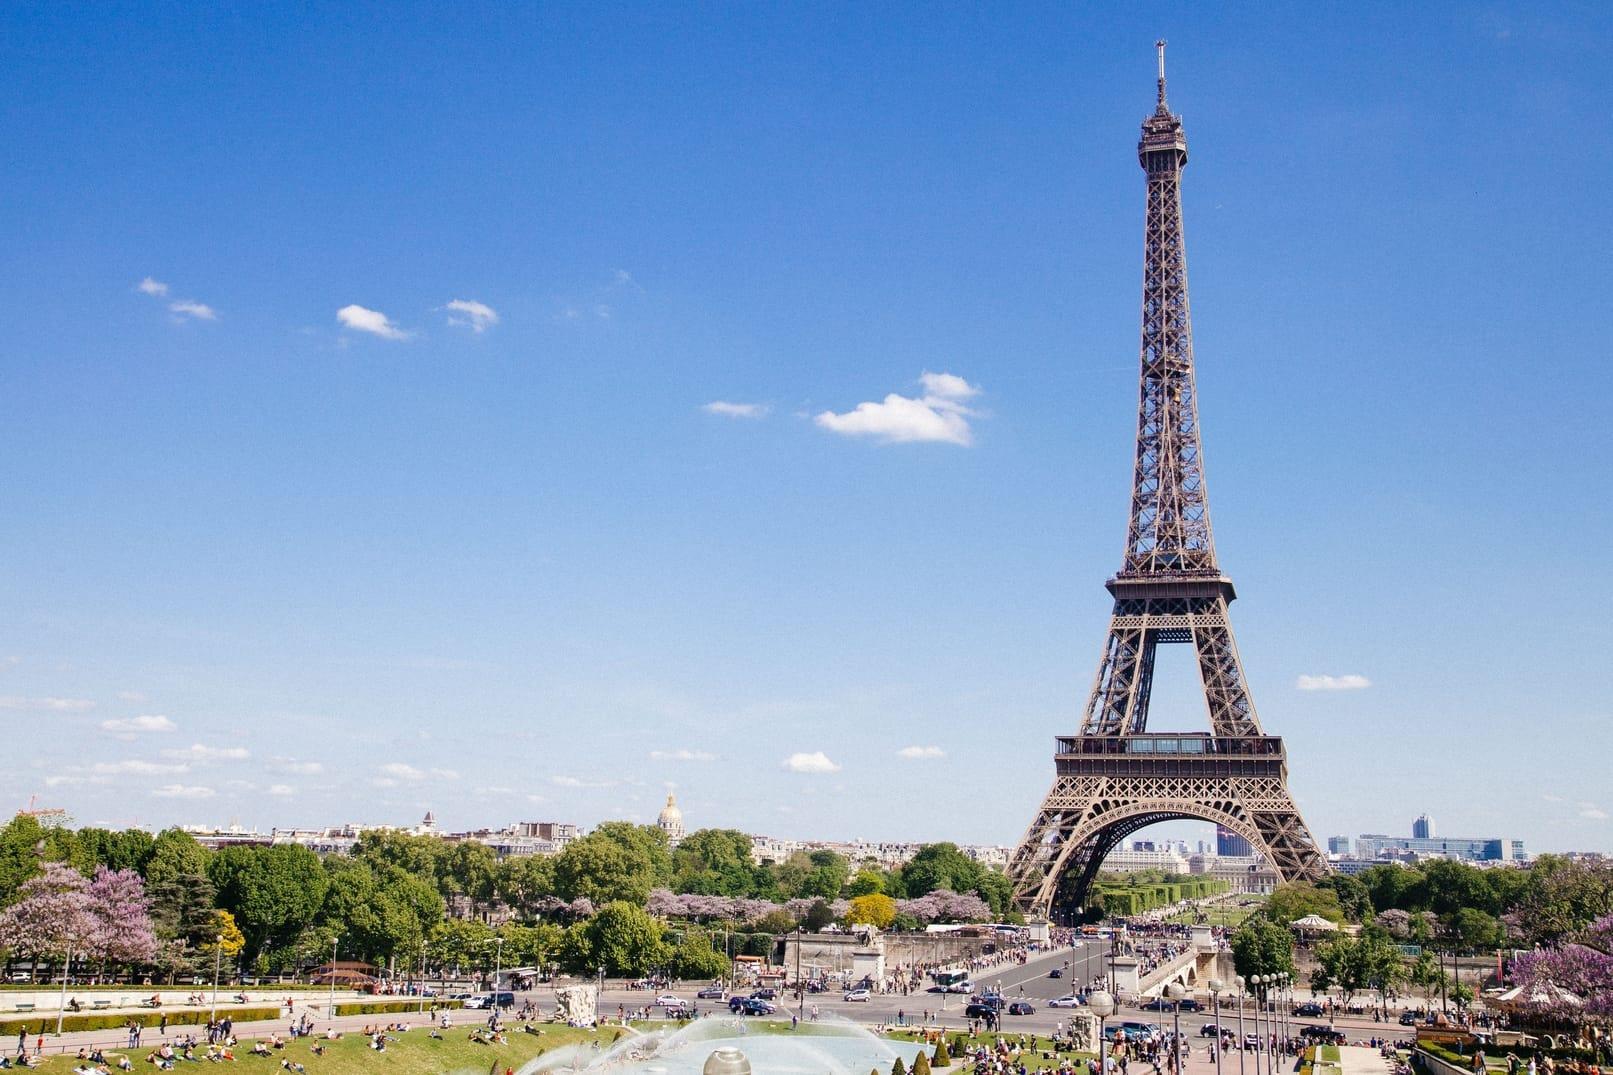 Tour Paris is always a good idea… - cherubins